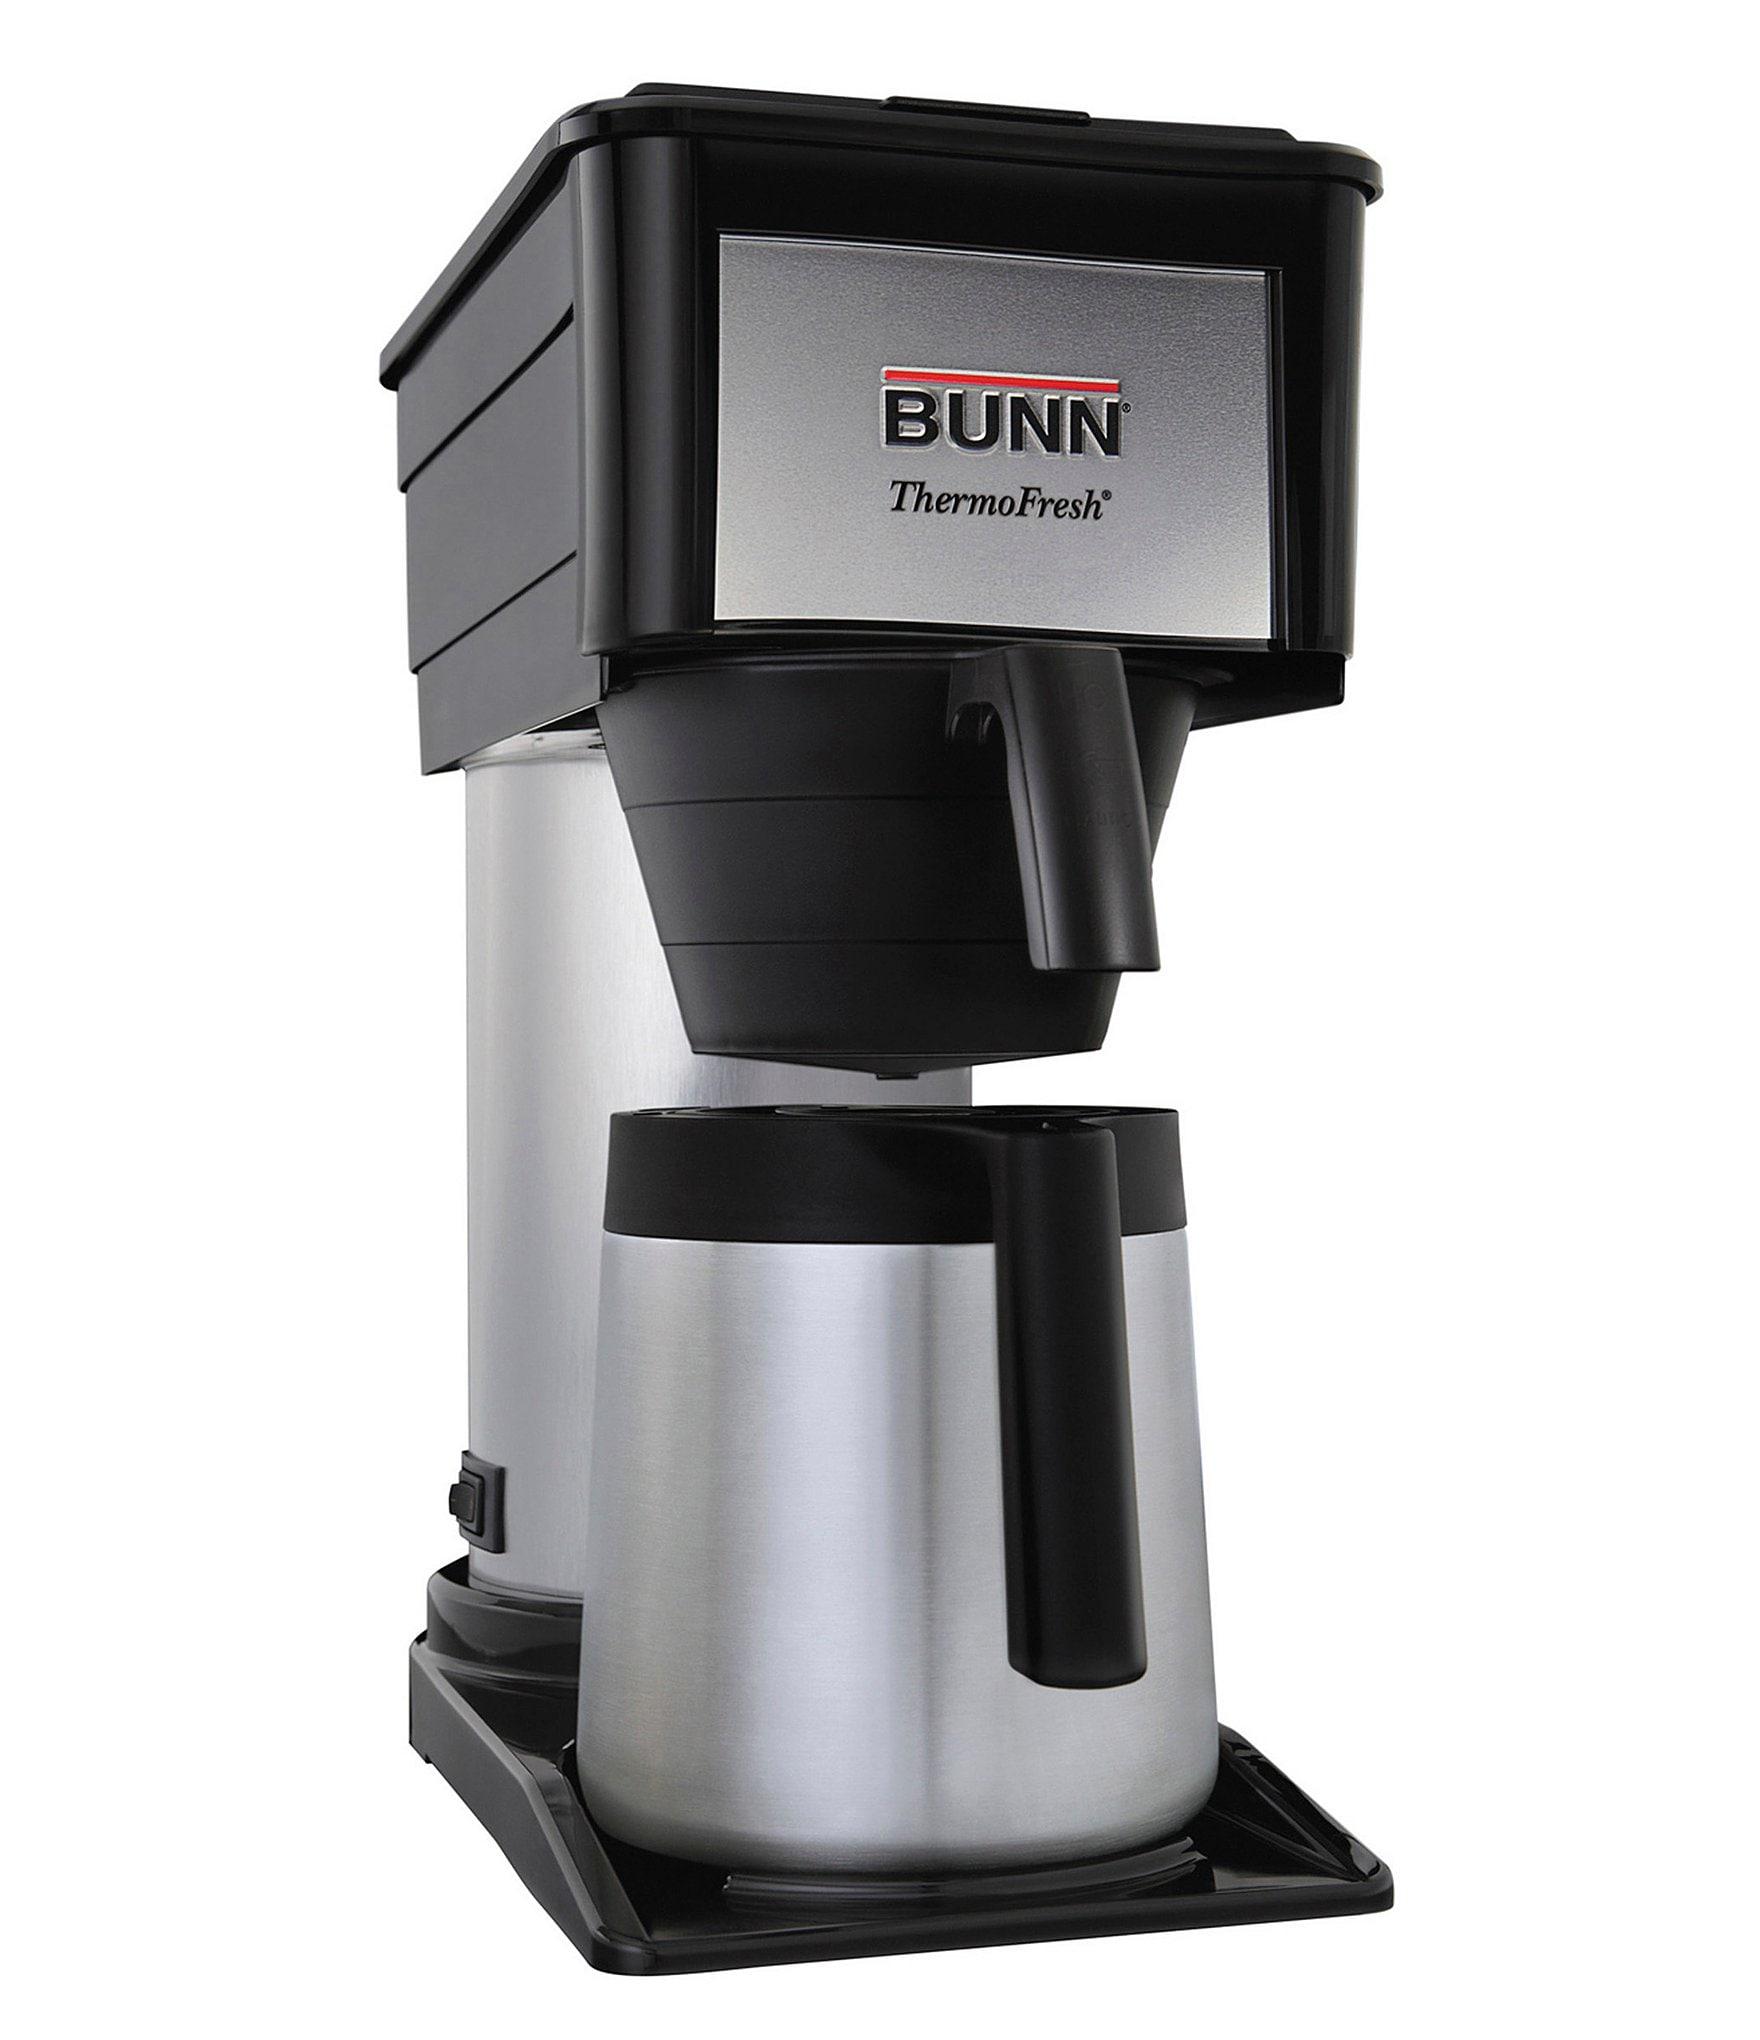 Bunn 10 Cup Thermofresh Coffee Brewer Dillards